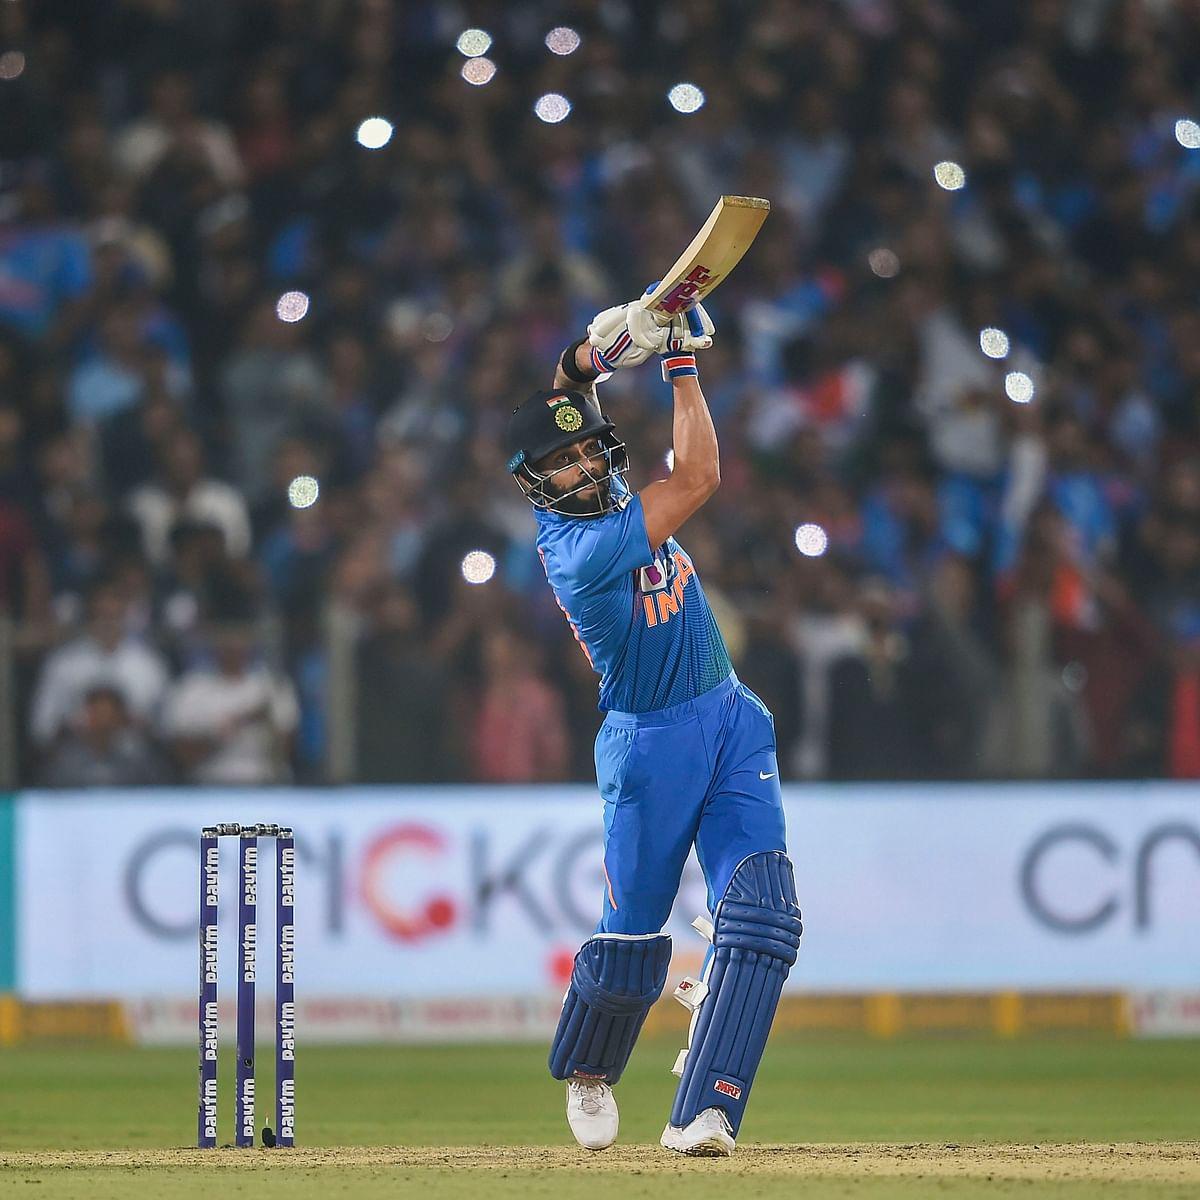 ICC 2019 Awards: Virat Kohli awarded ICC's '2019 Spirit of Cricket Award'